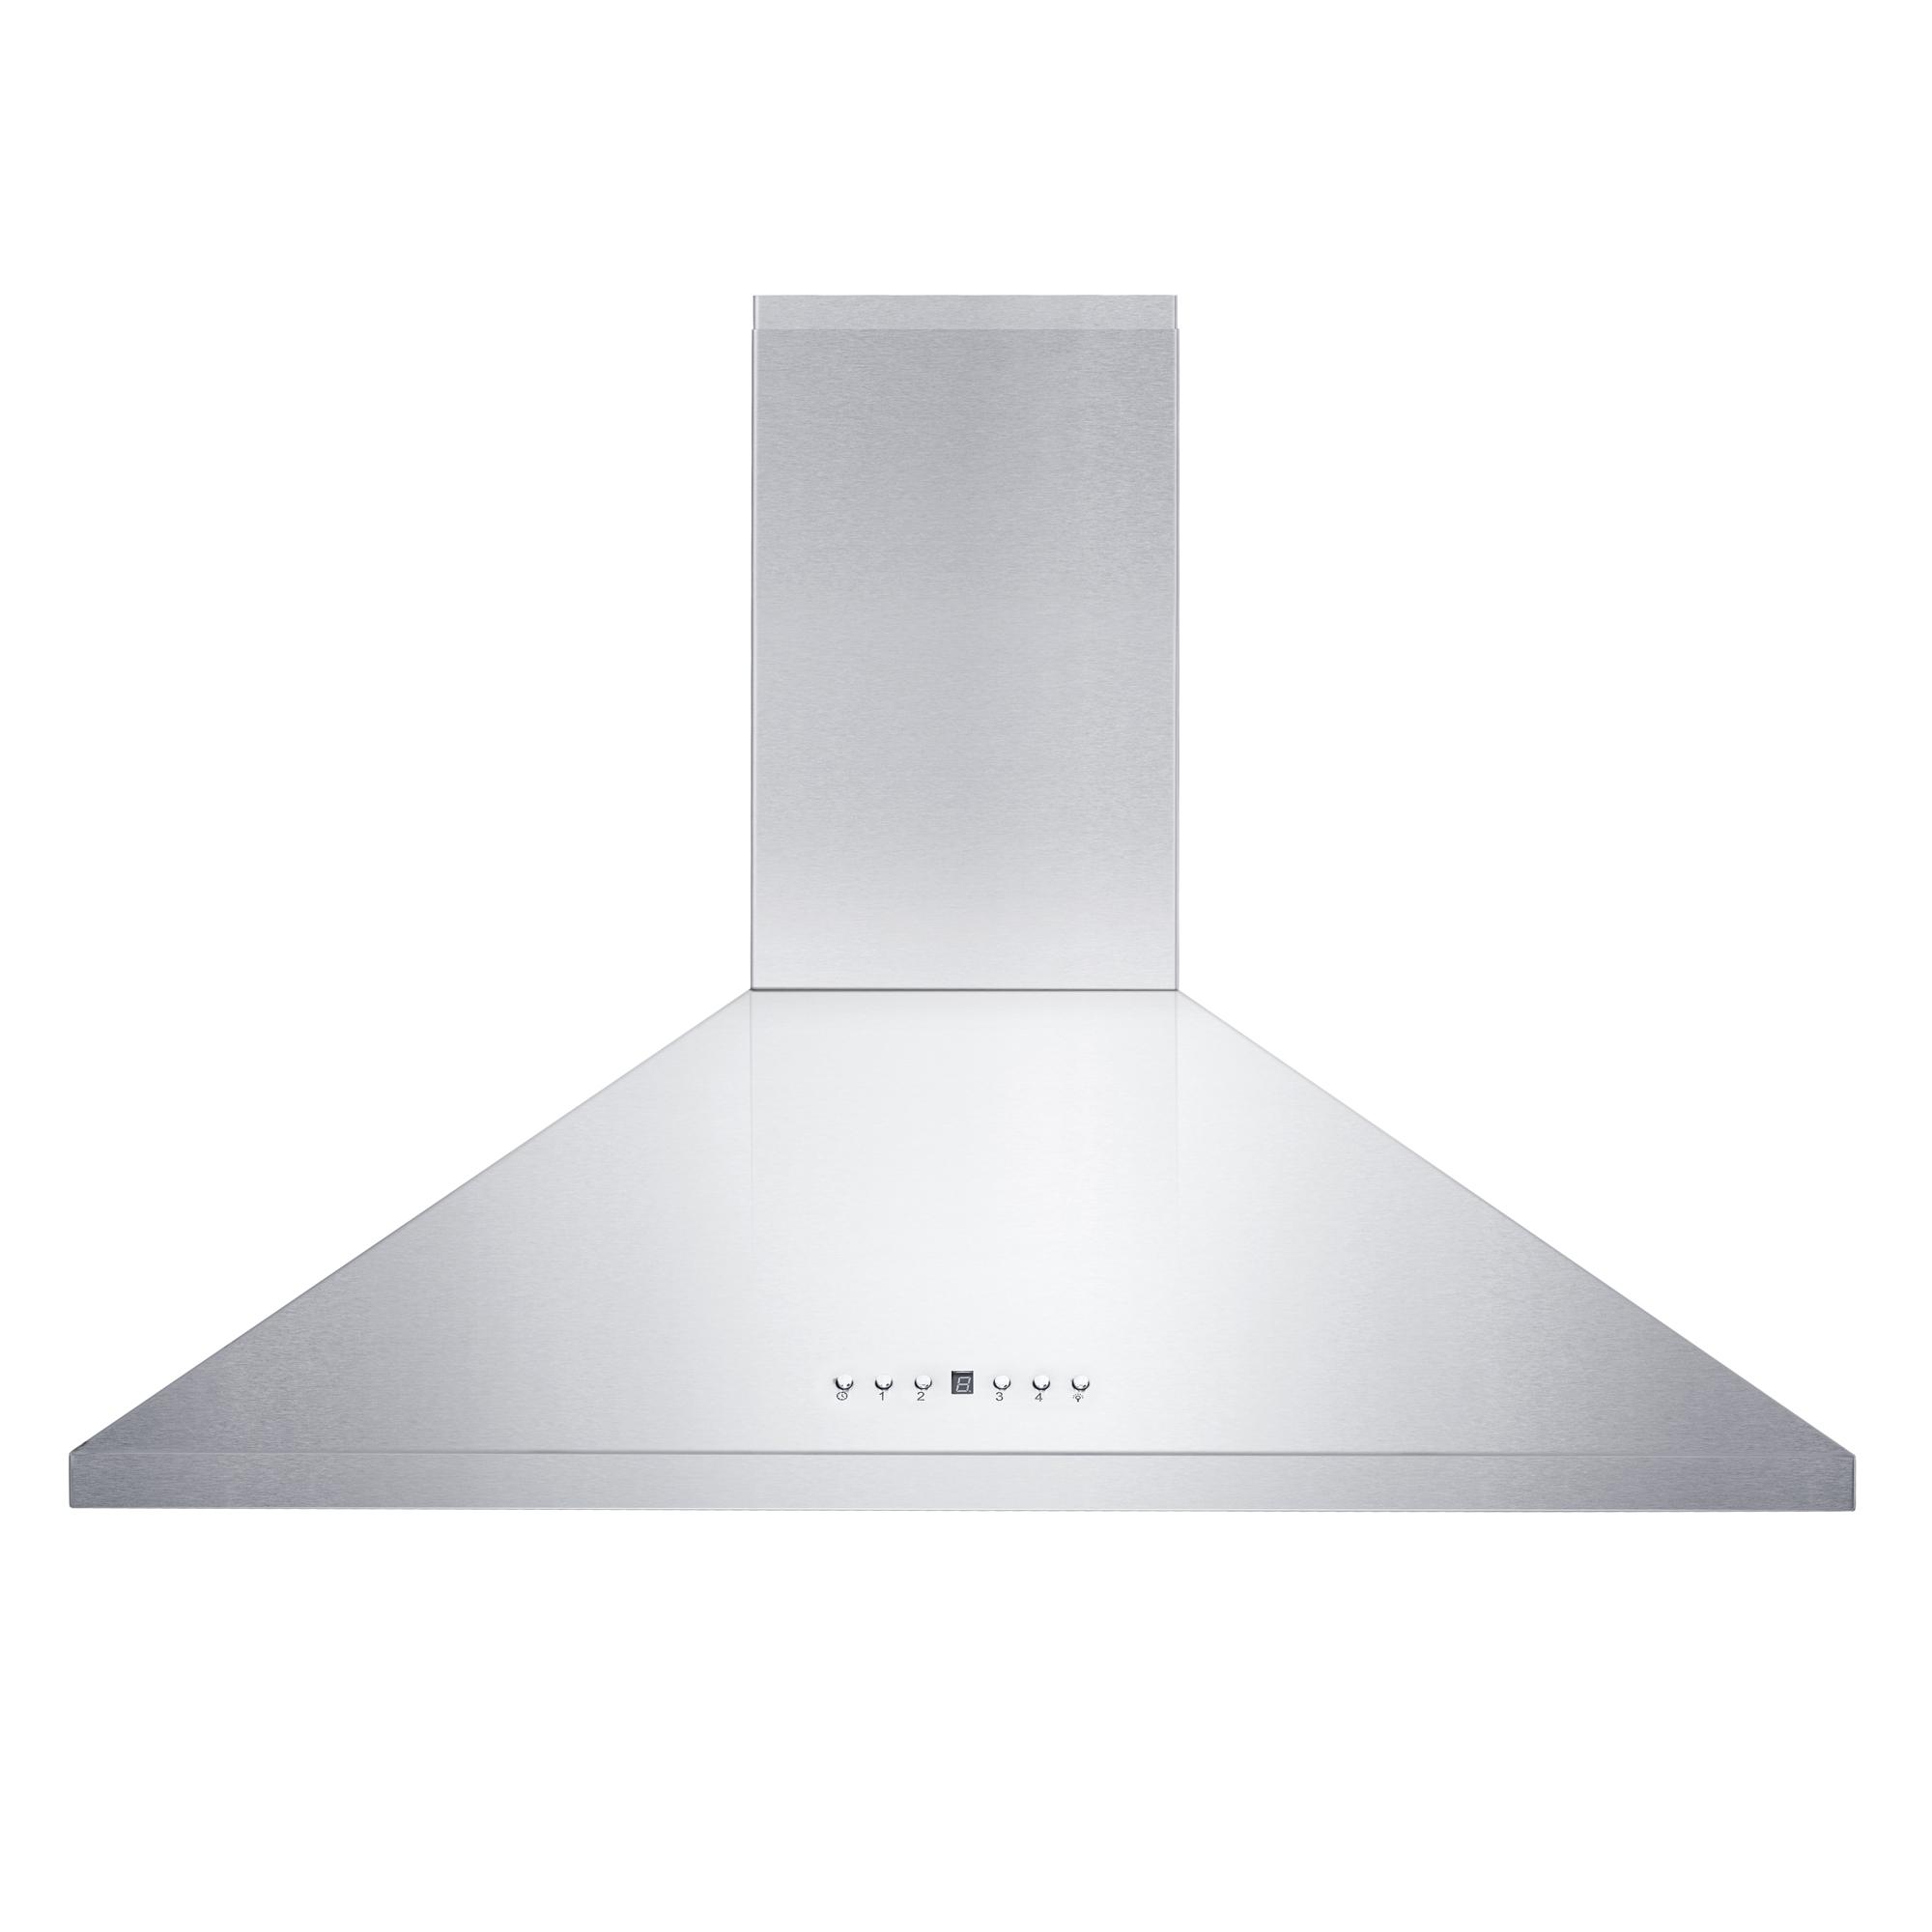 zline-stainless-steel-wall-mounted-range-hood-KL2-new-front.jpg